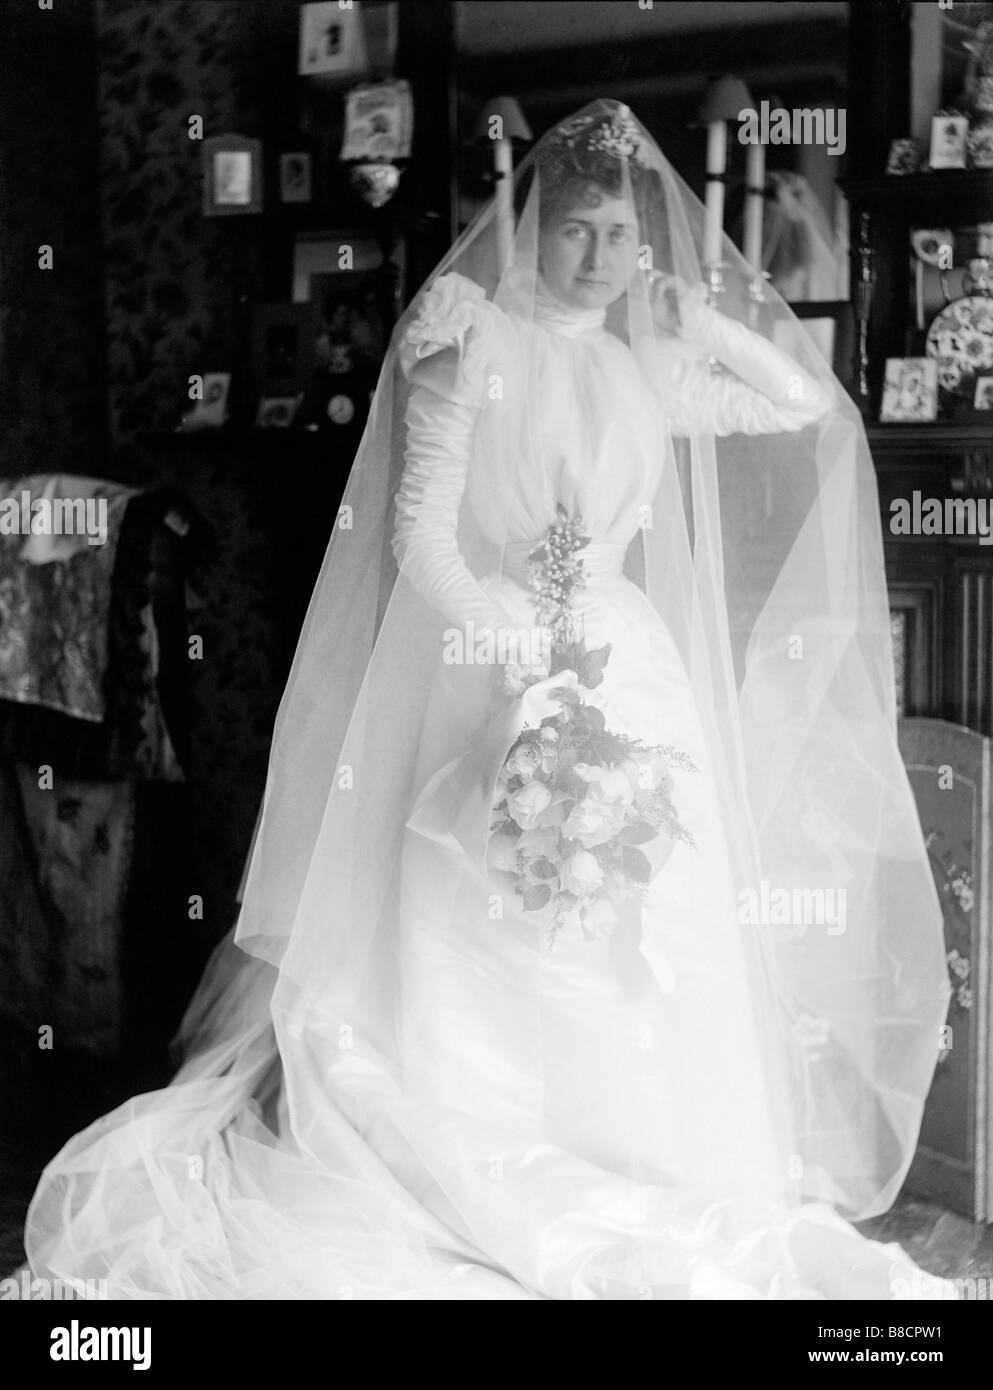 Wedding Dress Victorian Stockfotos & Wedding Dress Victorian Bilder ...